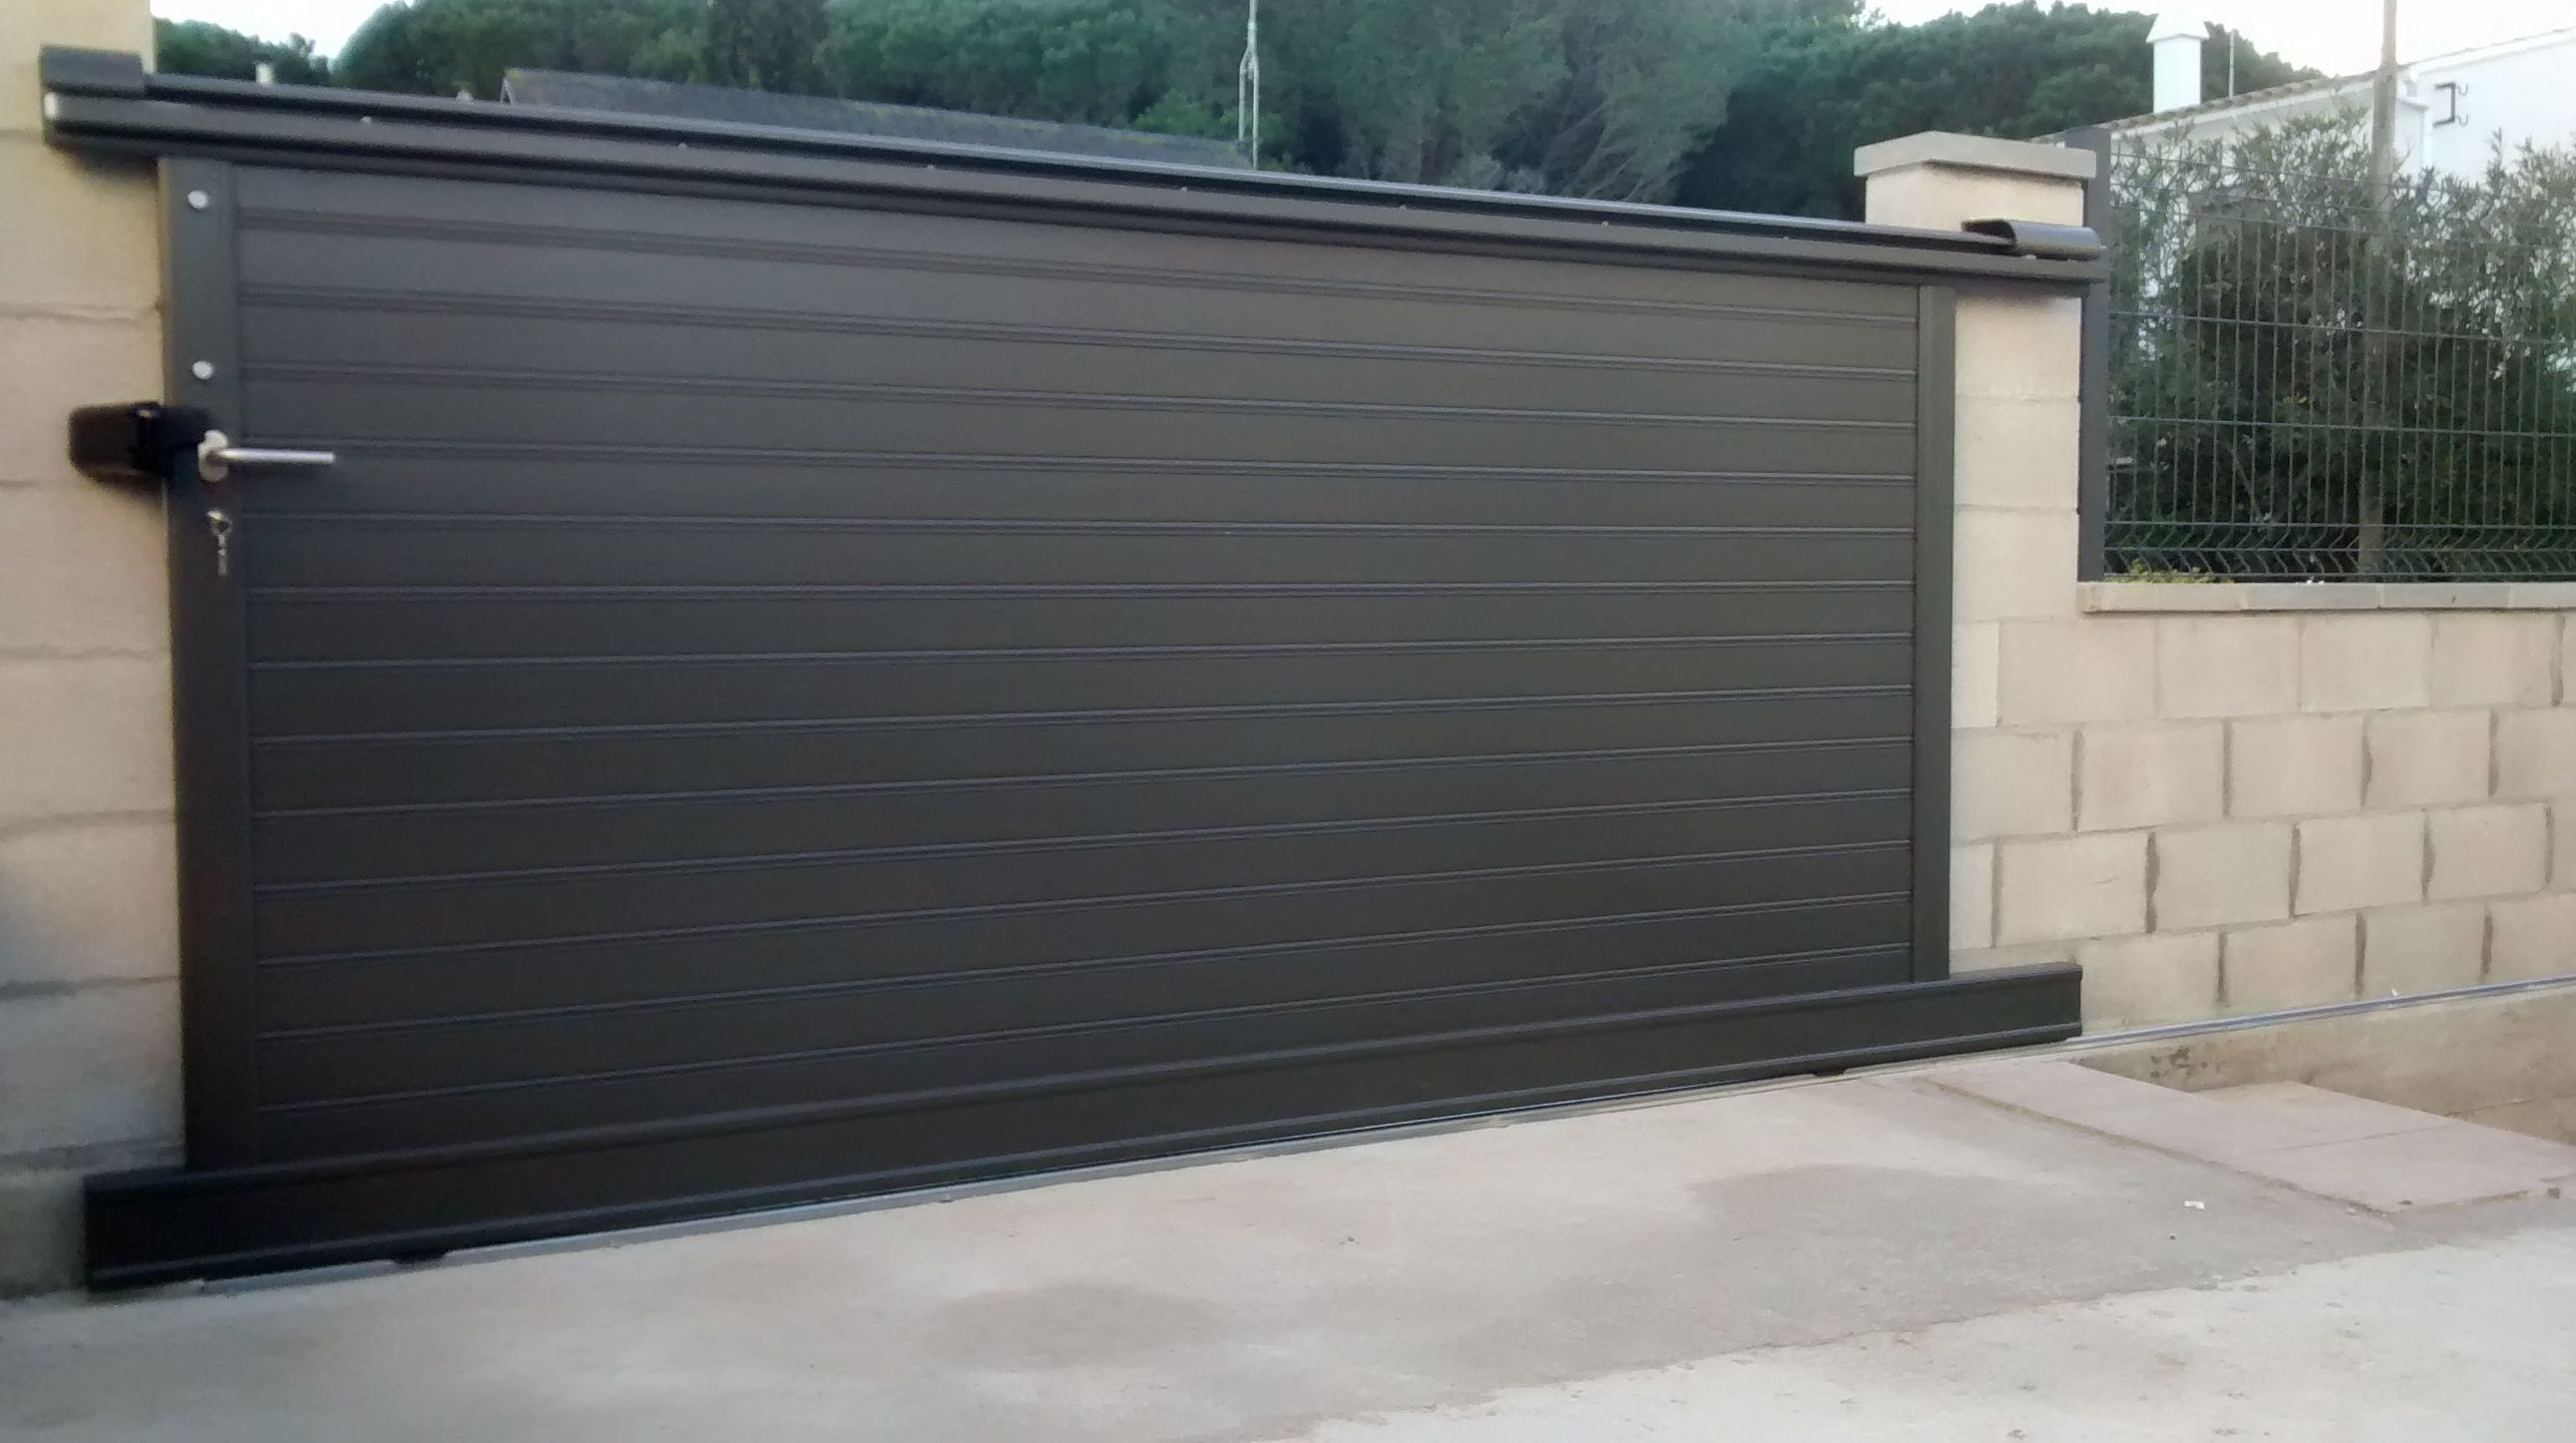 Puerta aluminio leroy merlin elegant fabulous best - Leroy merlin puertas exteriores ...